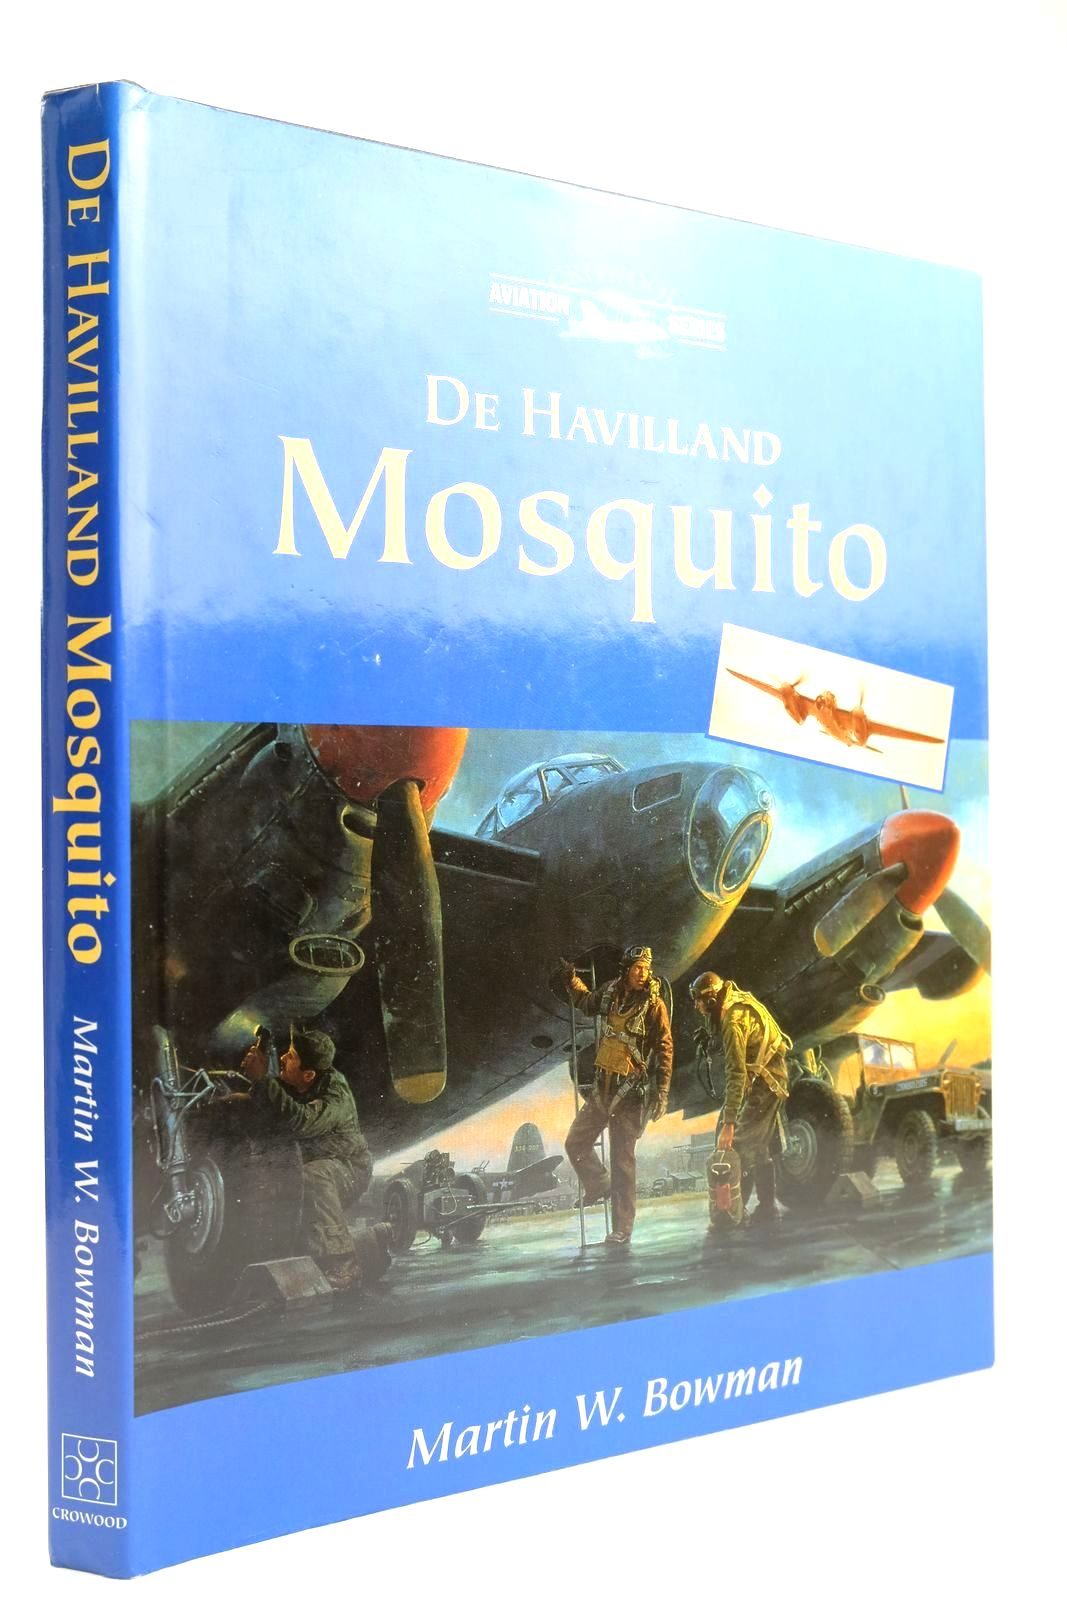 Photo of DE HAVILLAND MOSQUITO- Stock Number: 2132172